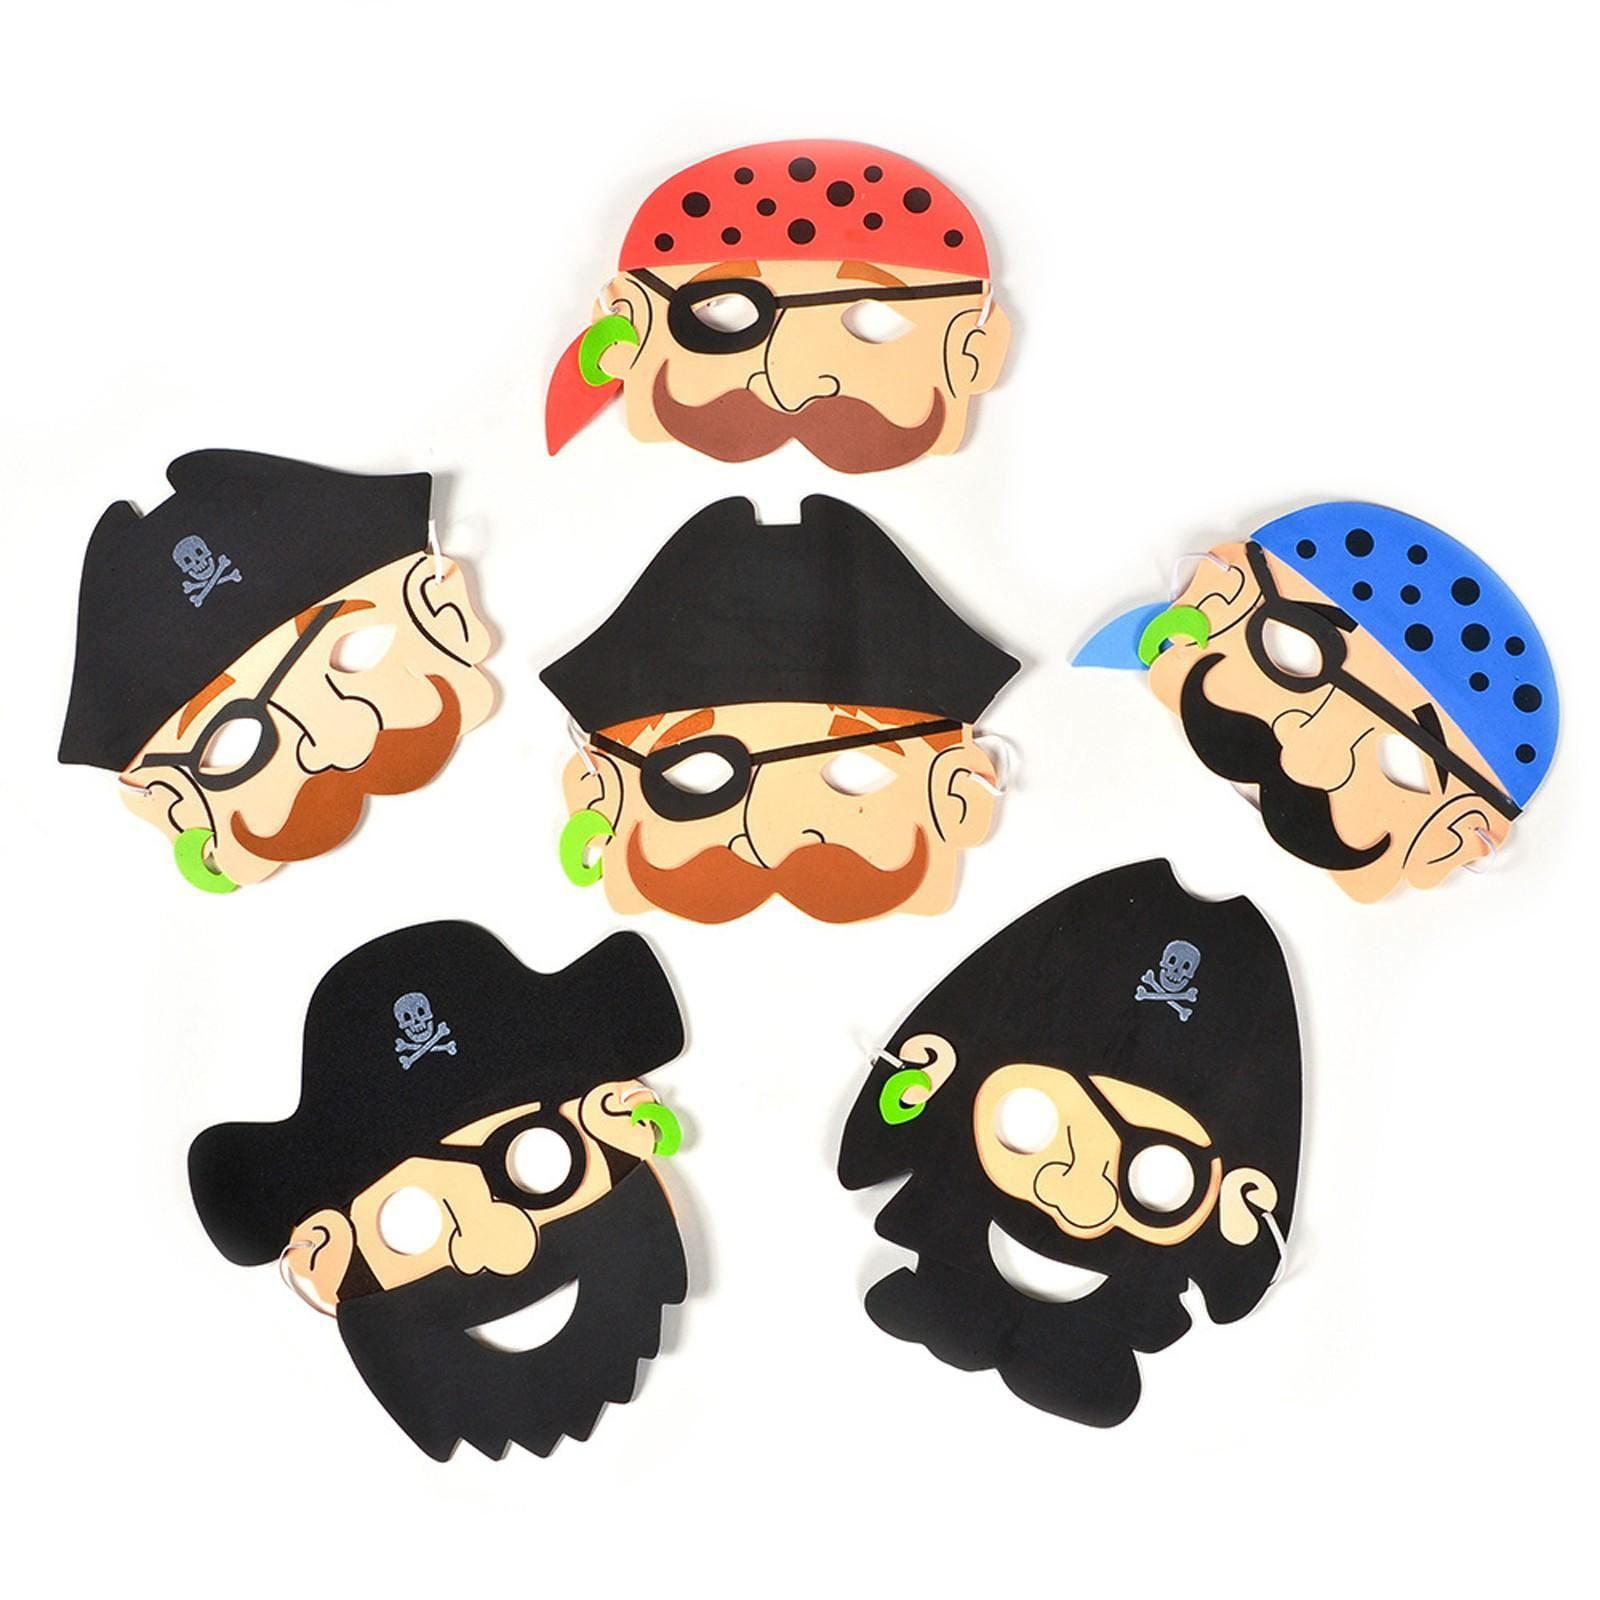 1,6,12 Pirate Telescopes Kid/'s Party Loot Bag Fillers Fun Fancy Dress Mini Toys